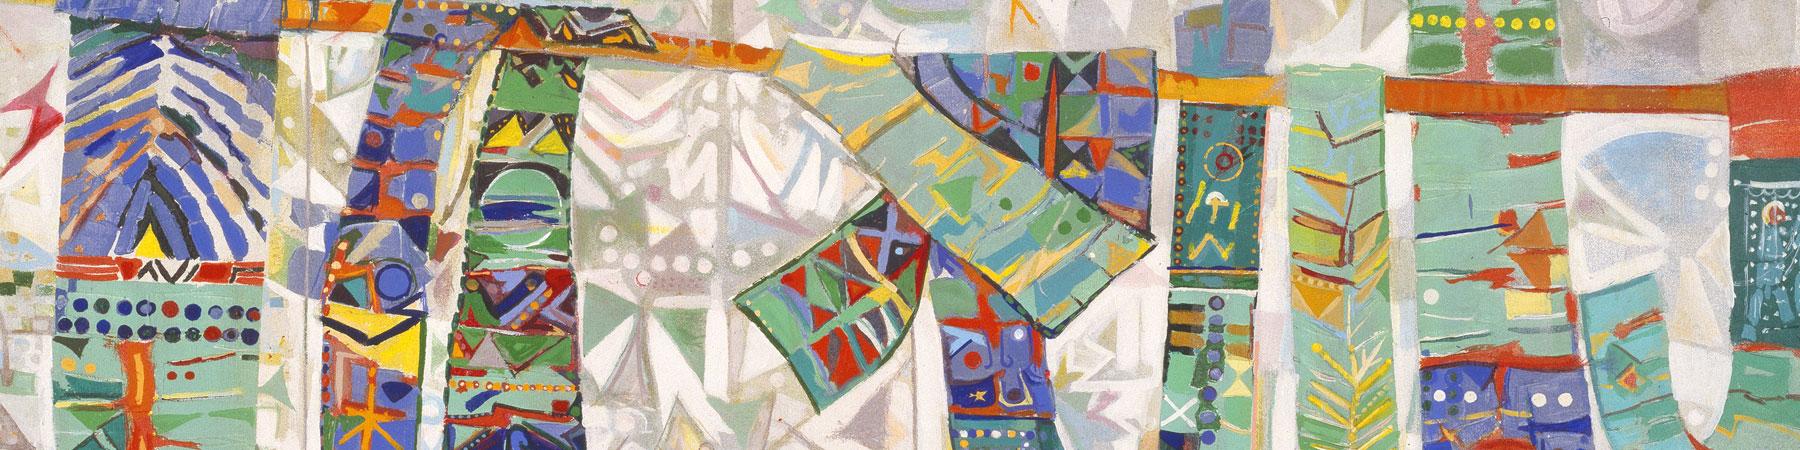 IN THE MUSEUM: Healing Arts